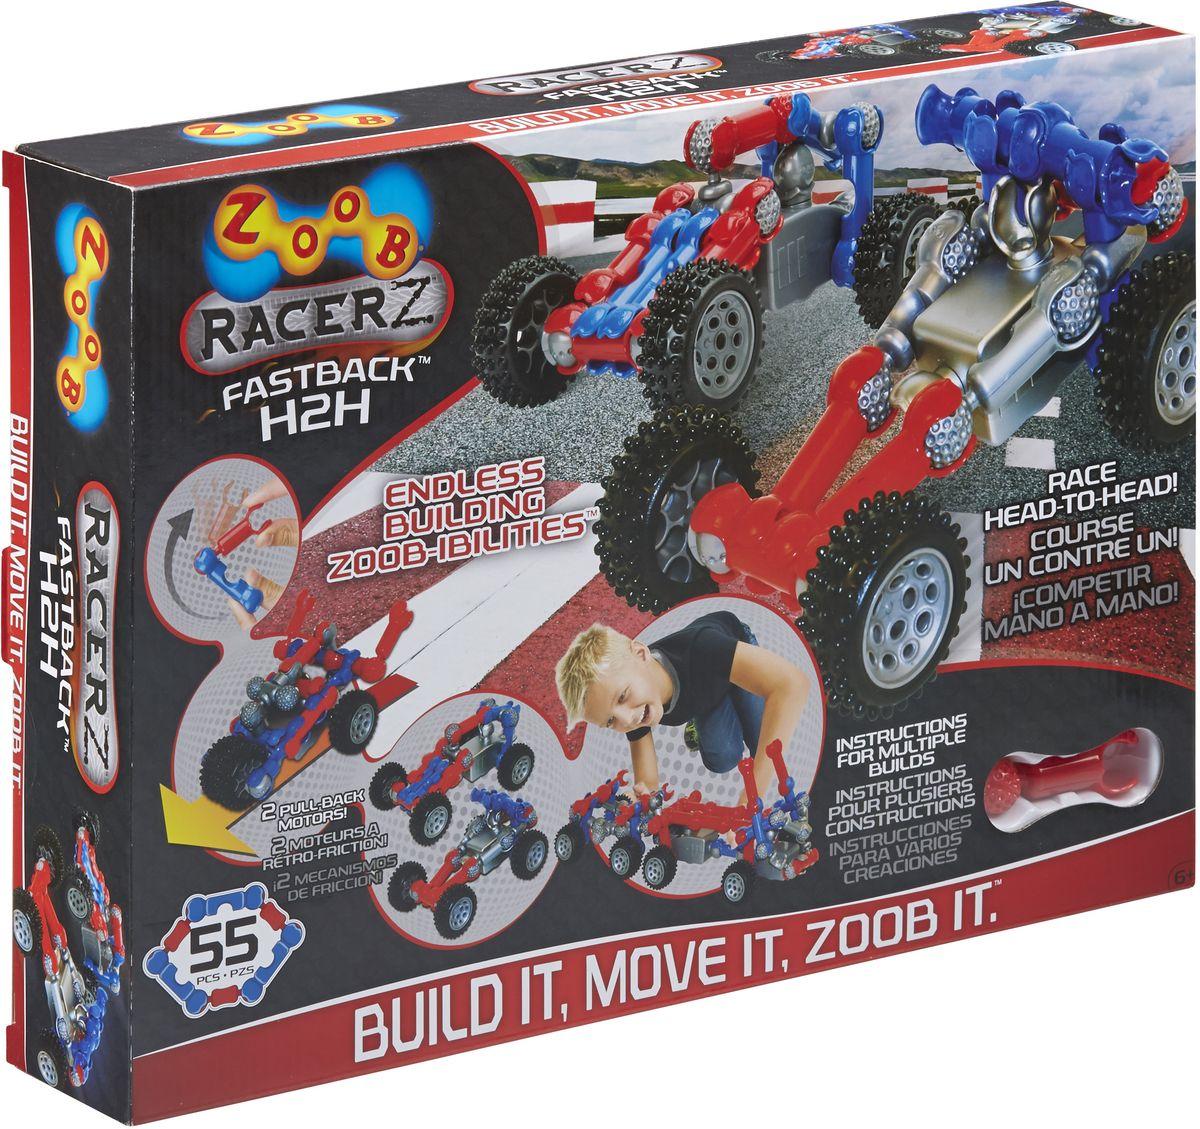 Zoob Racer Z Конструктор Fastback H2H zoob конструктор zoob racer z car designer 76 деталей